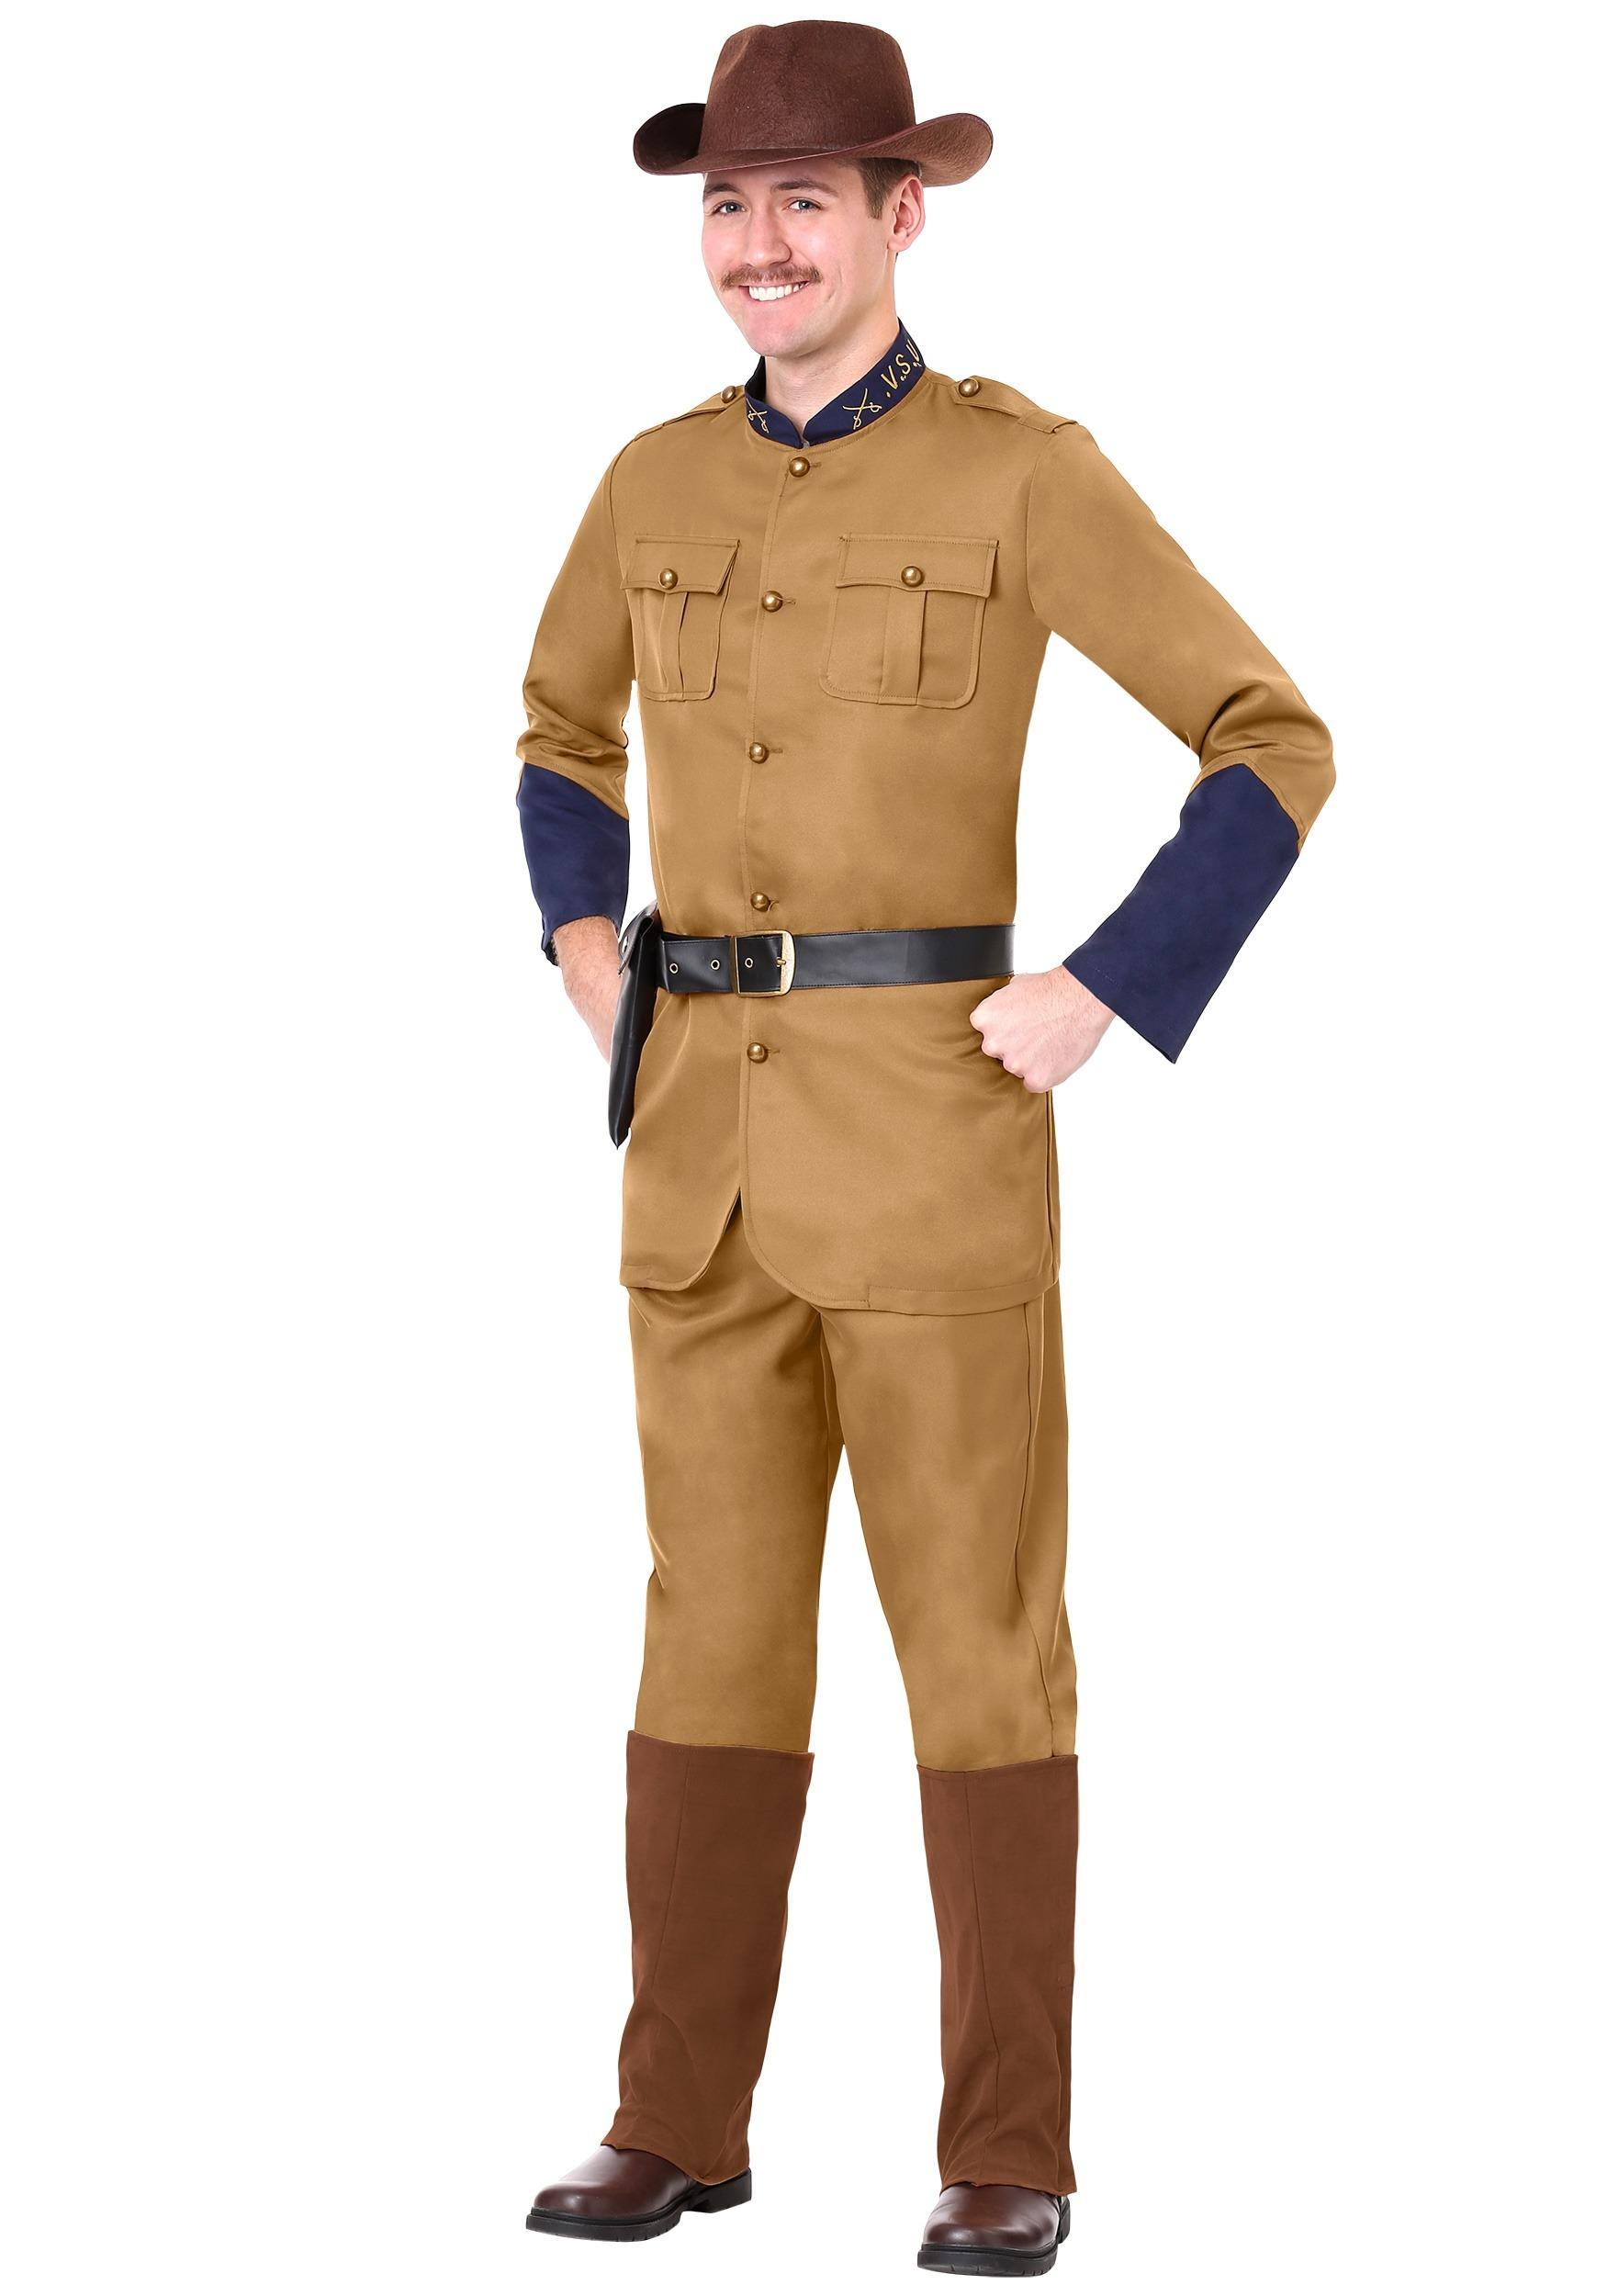 Teddy Roosevelt Men's Costume